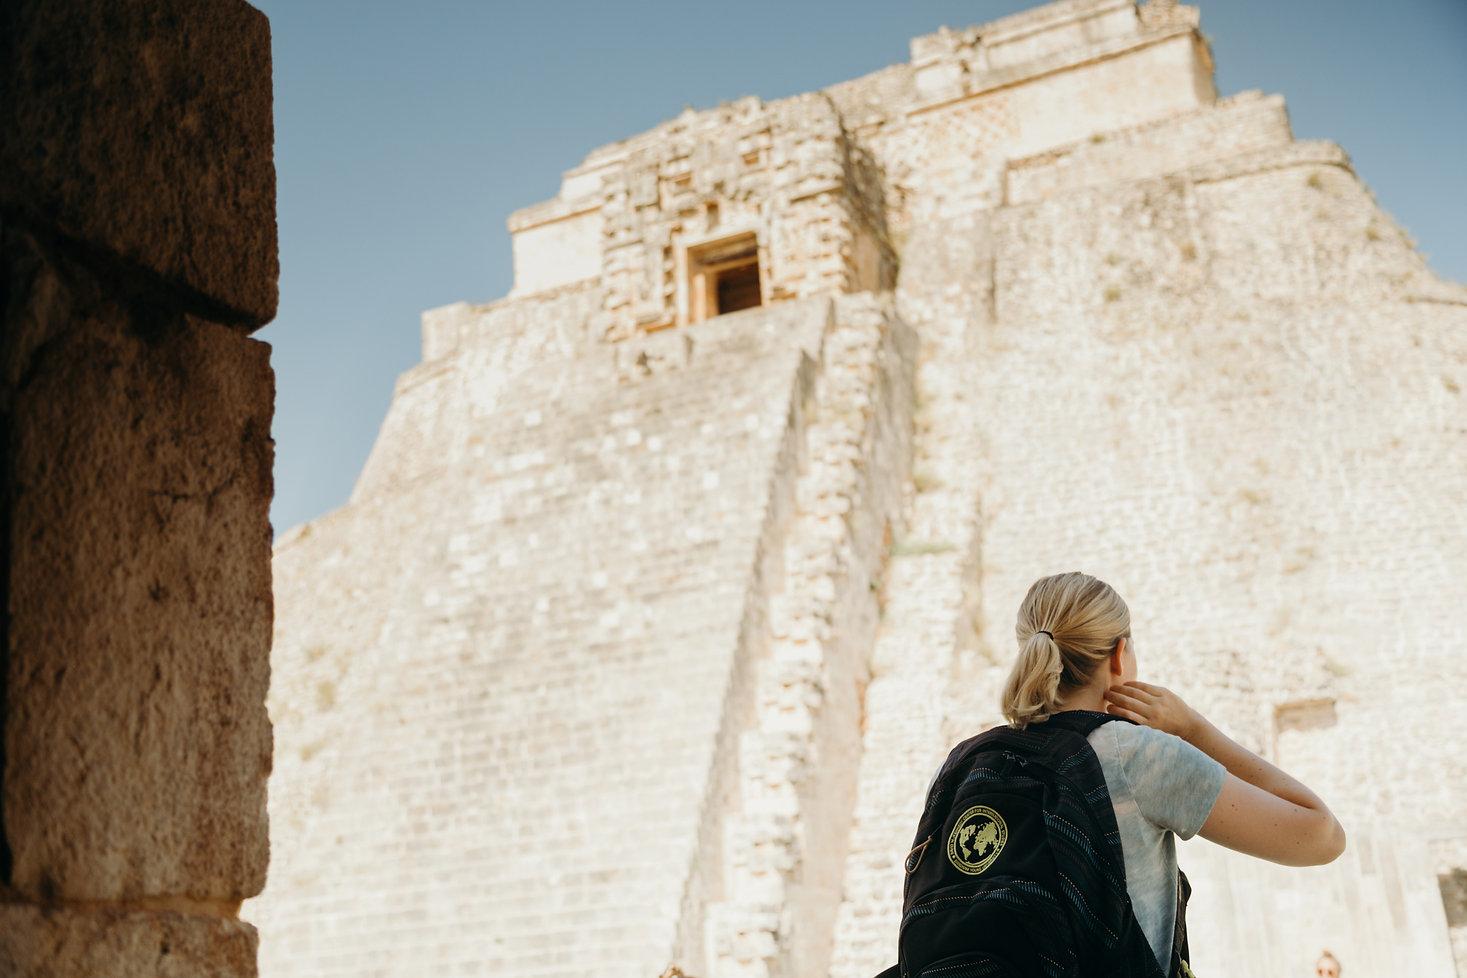 byu student mexico ruin backpack.jpg